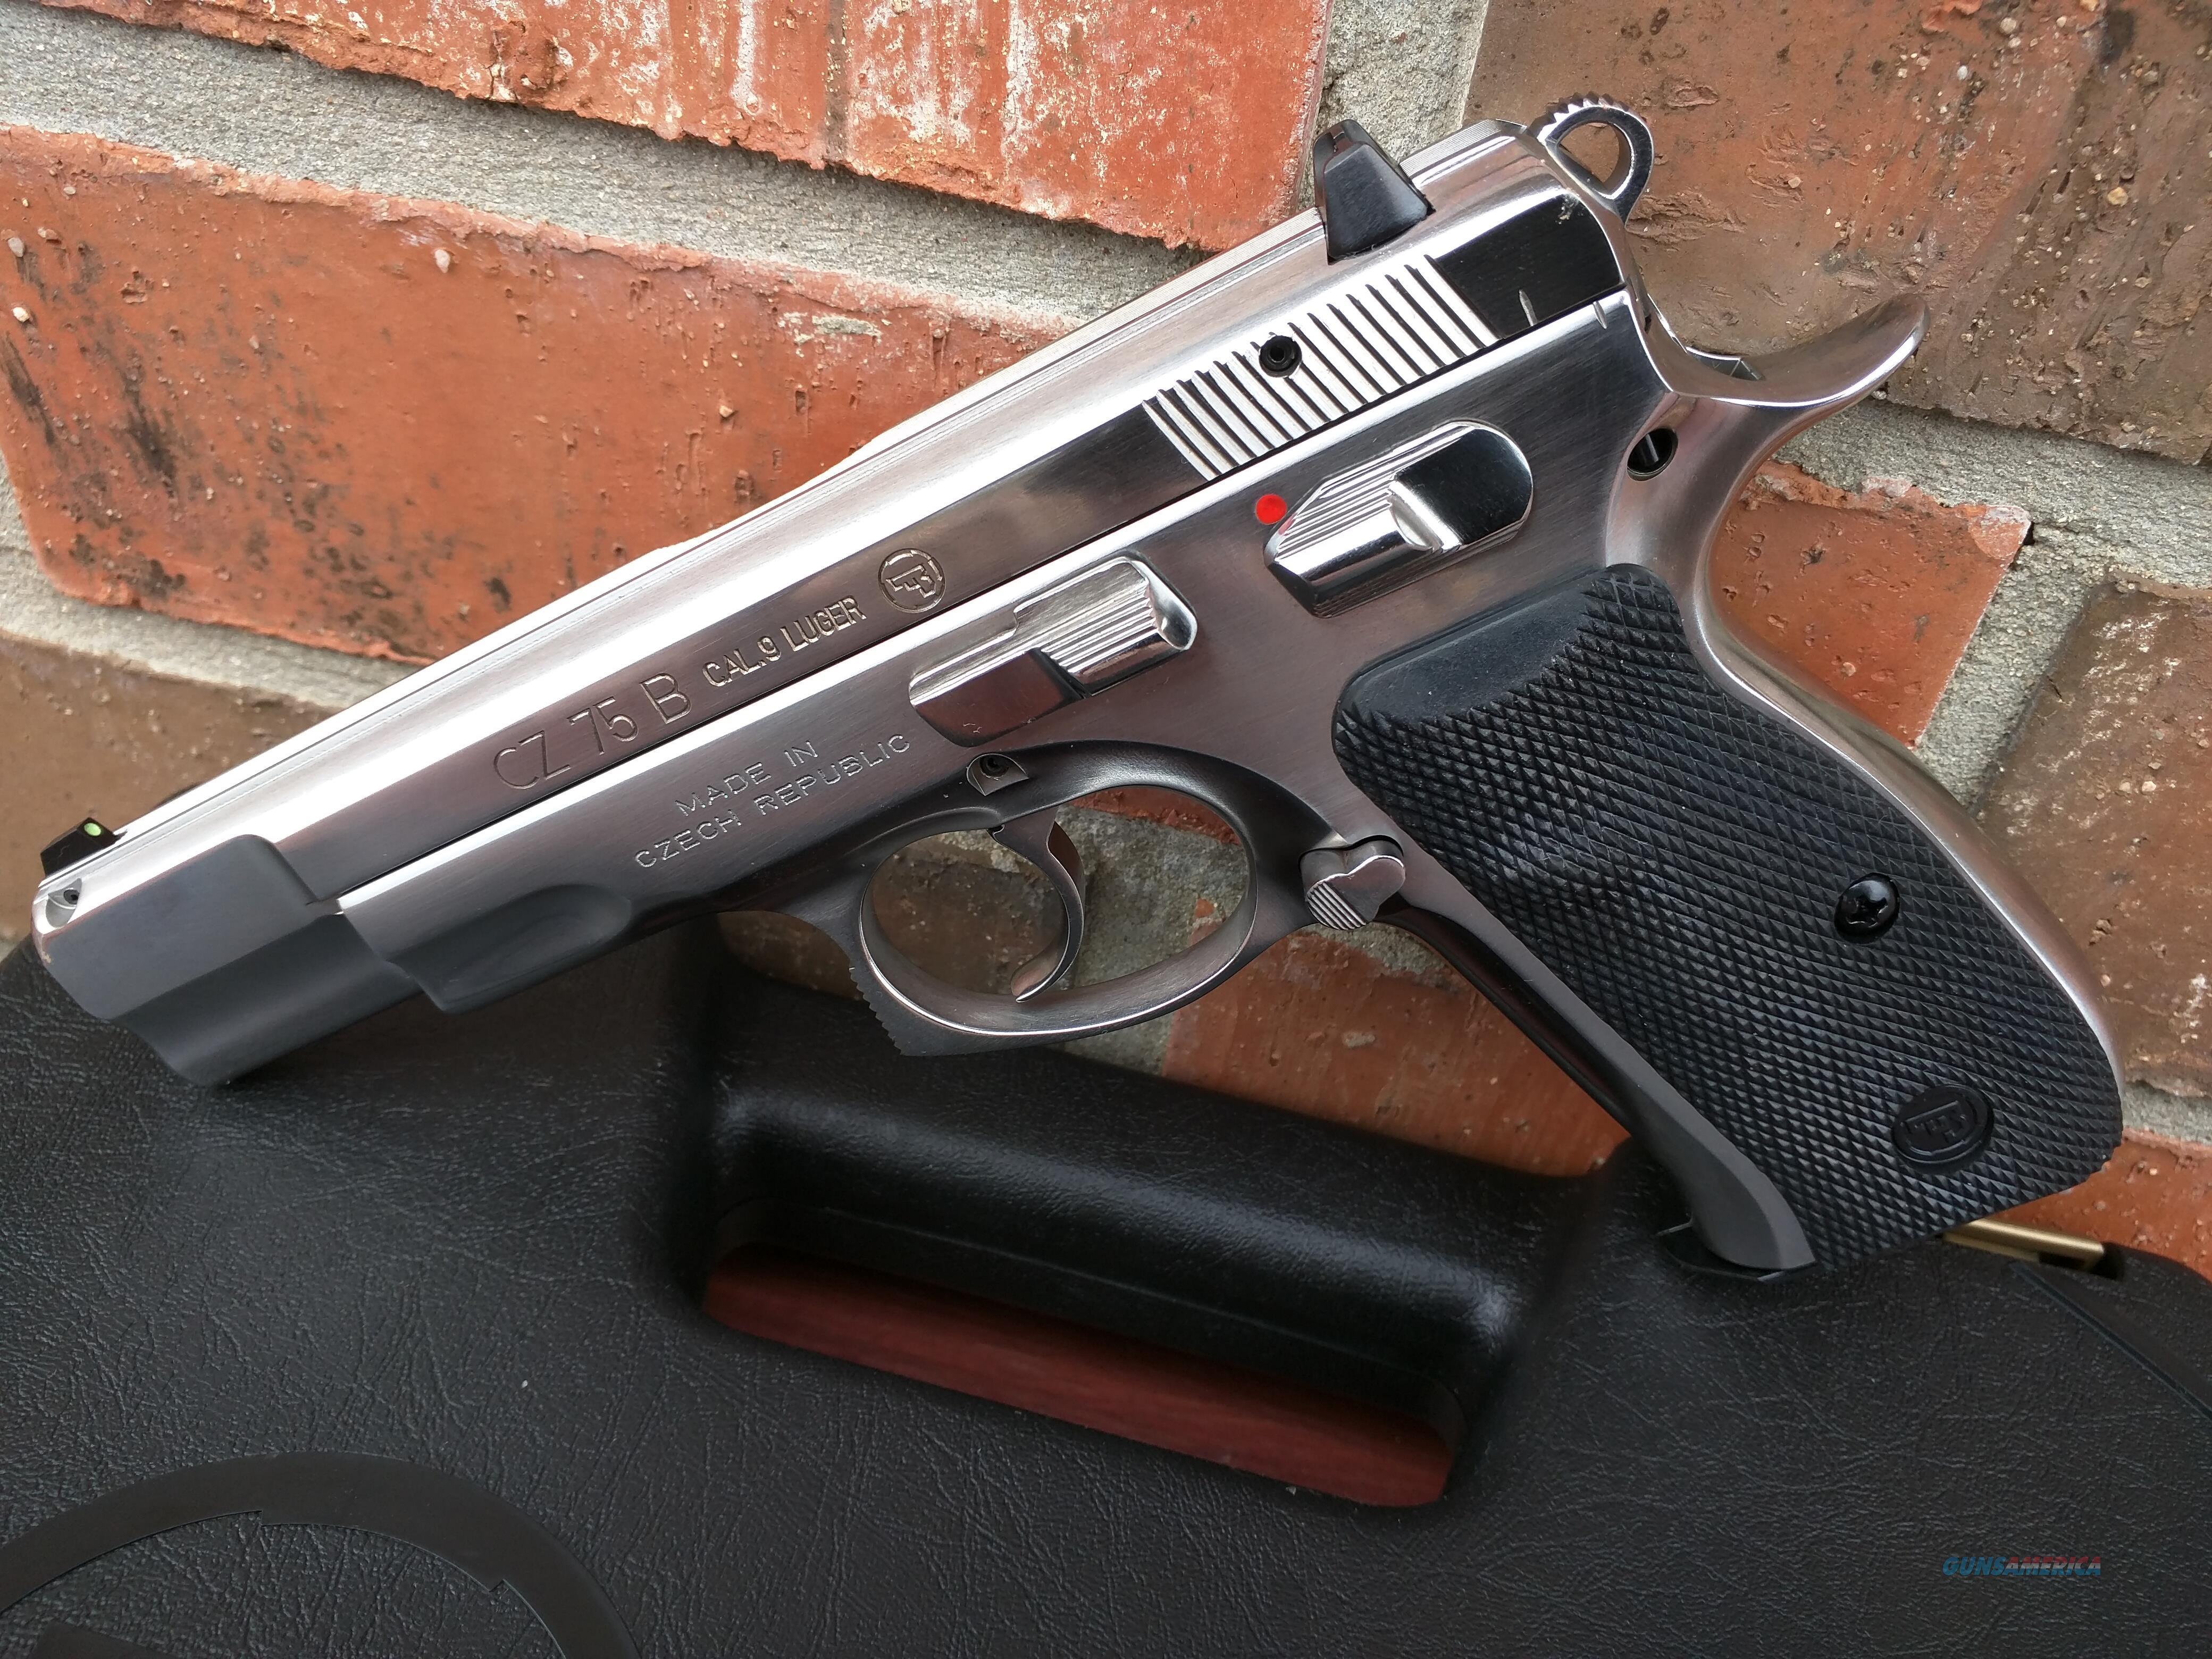 CZ CZ USA 75 B 75B,SA/DA, 9mm, High polished Stainless, 3 dot sights, 2-16 round mags, Great Trigger!!, NIB, Free Layaway  Guns > Pistols > CZ Pistols